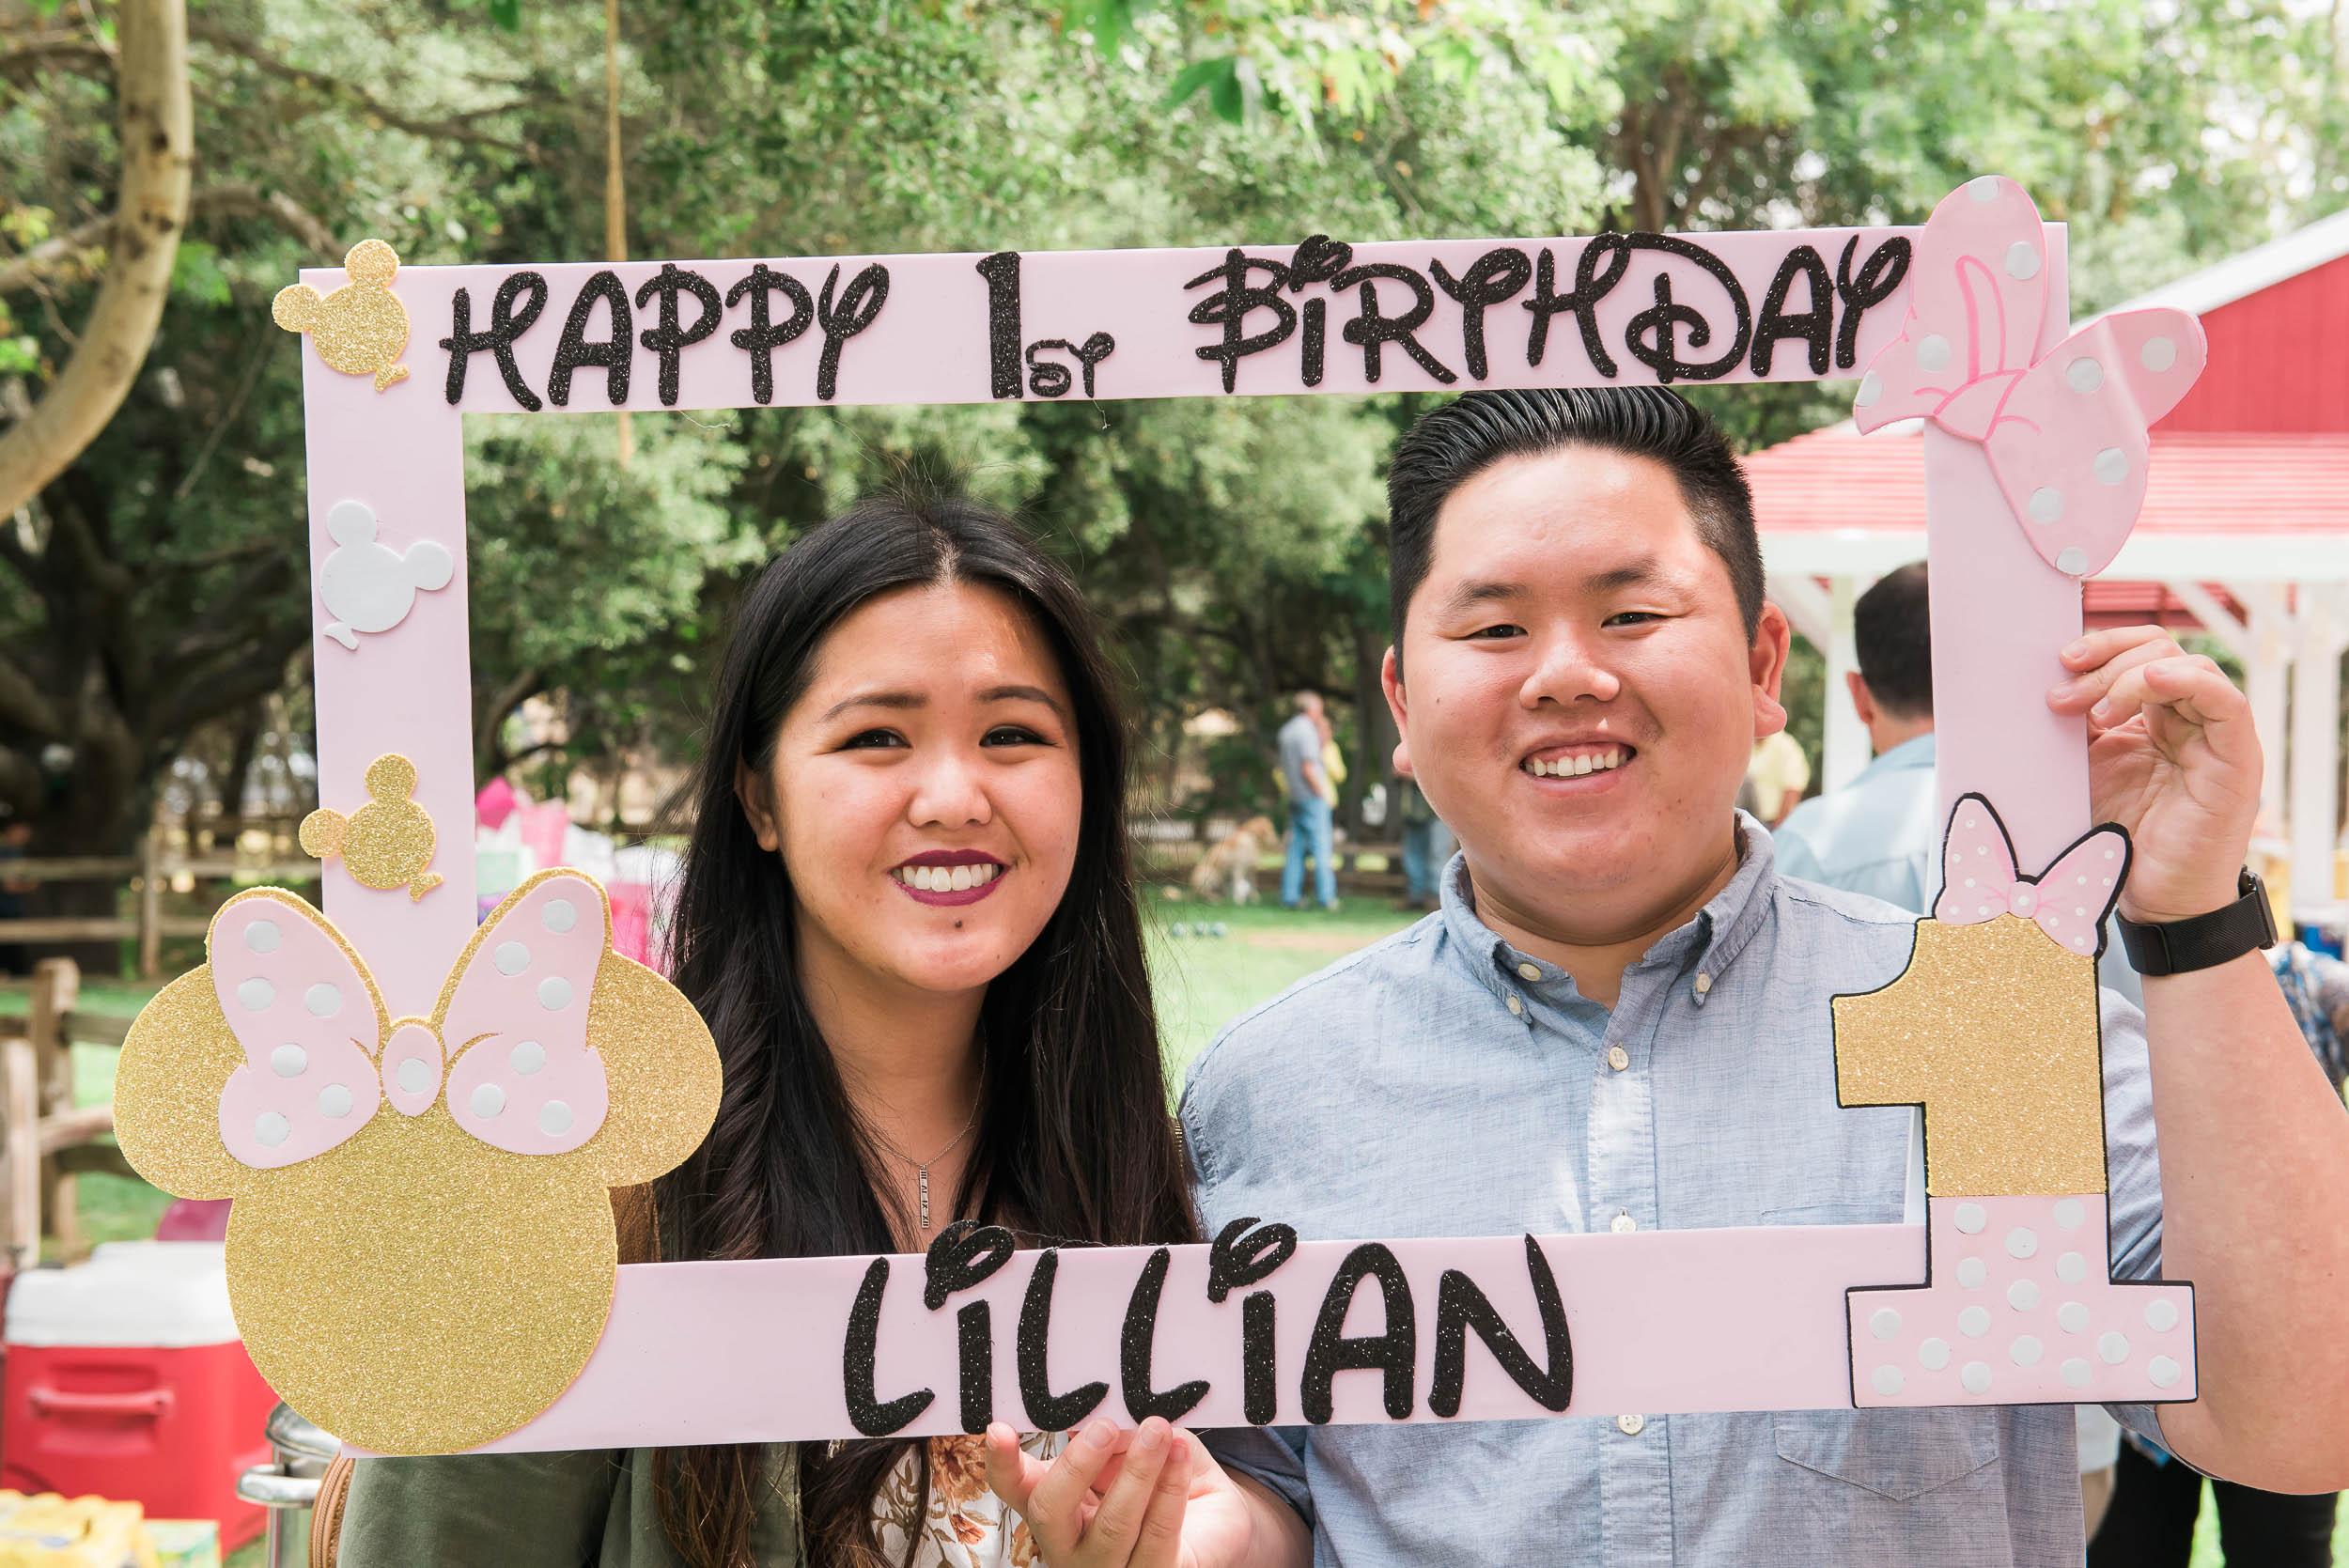 Bryan-Miraflor-Photography-Lillian's-1st-Birthday-Irvine-Railroad-Park-20170409-0040.jpg